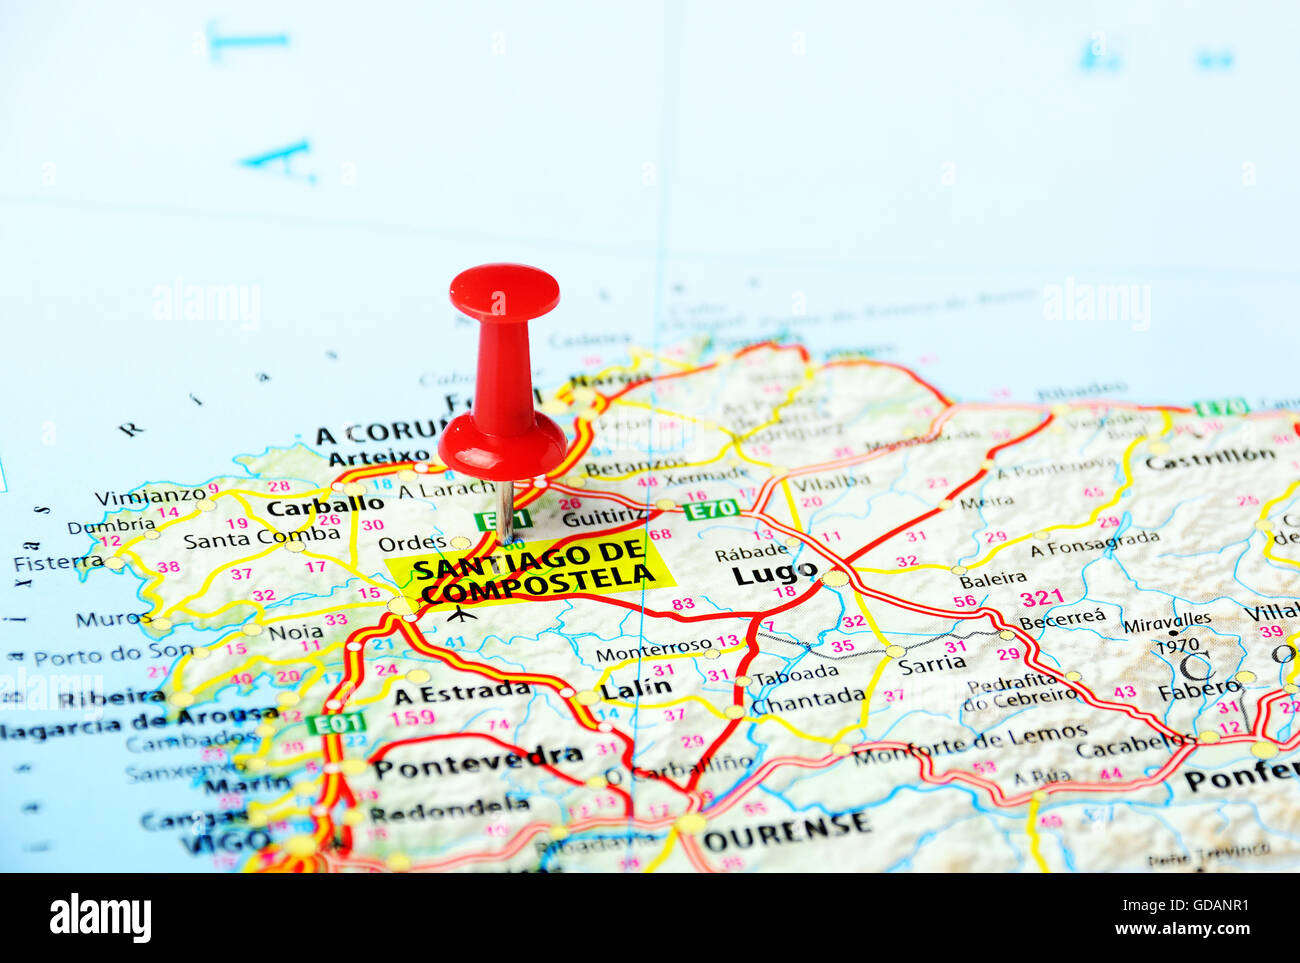 Santiago de Compostela Spain map Travel concept Stock Photo